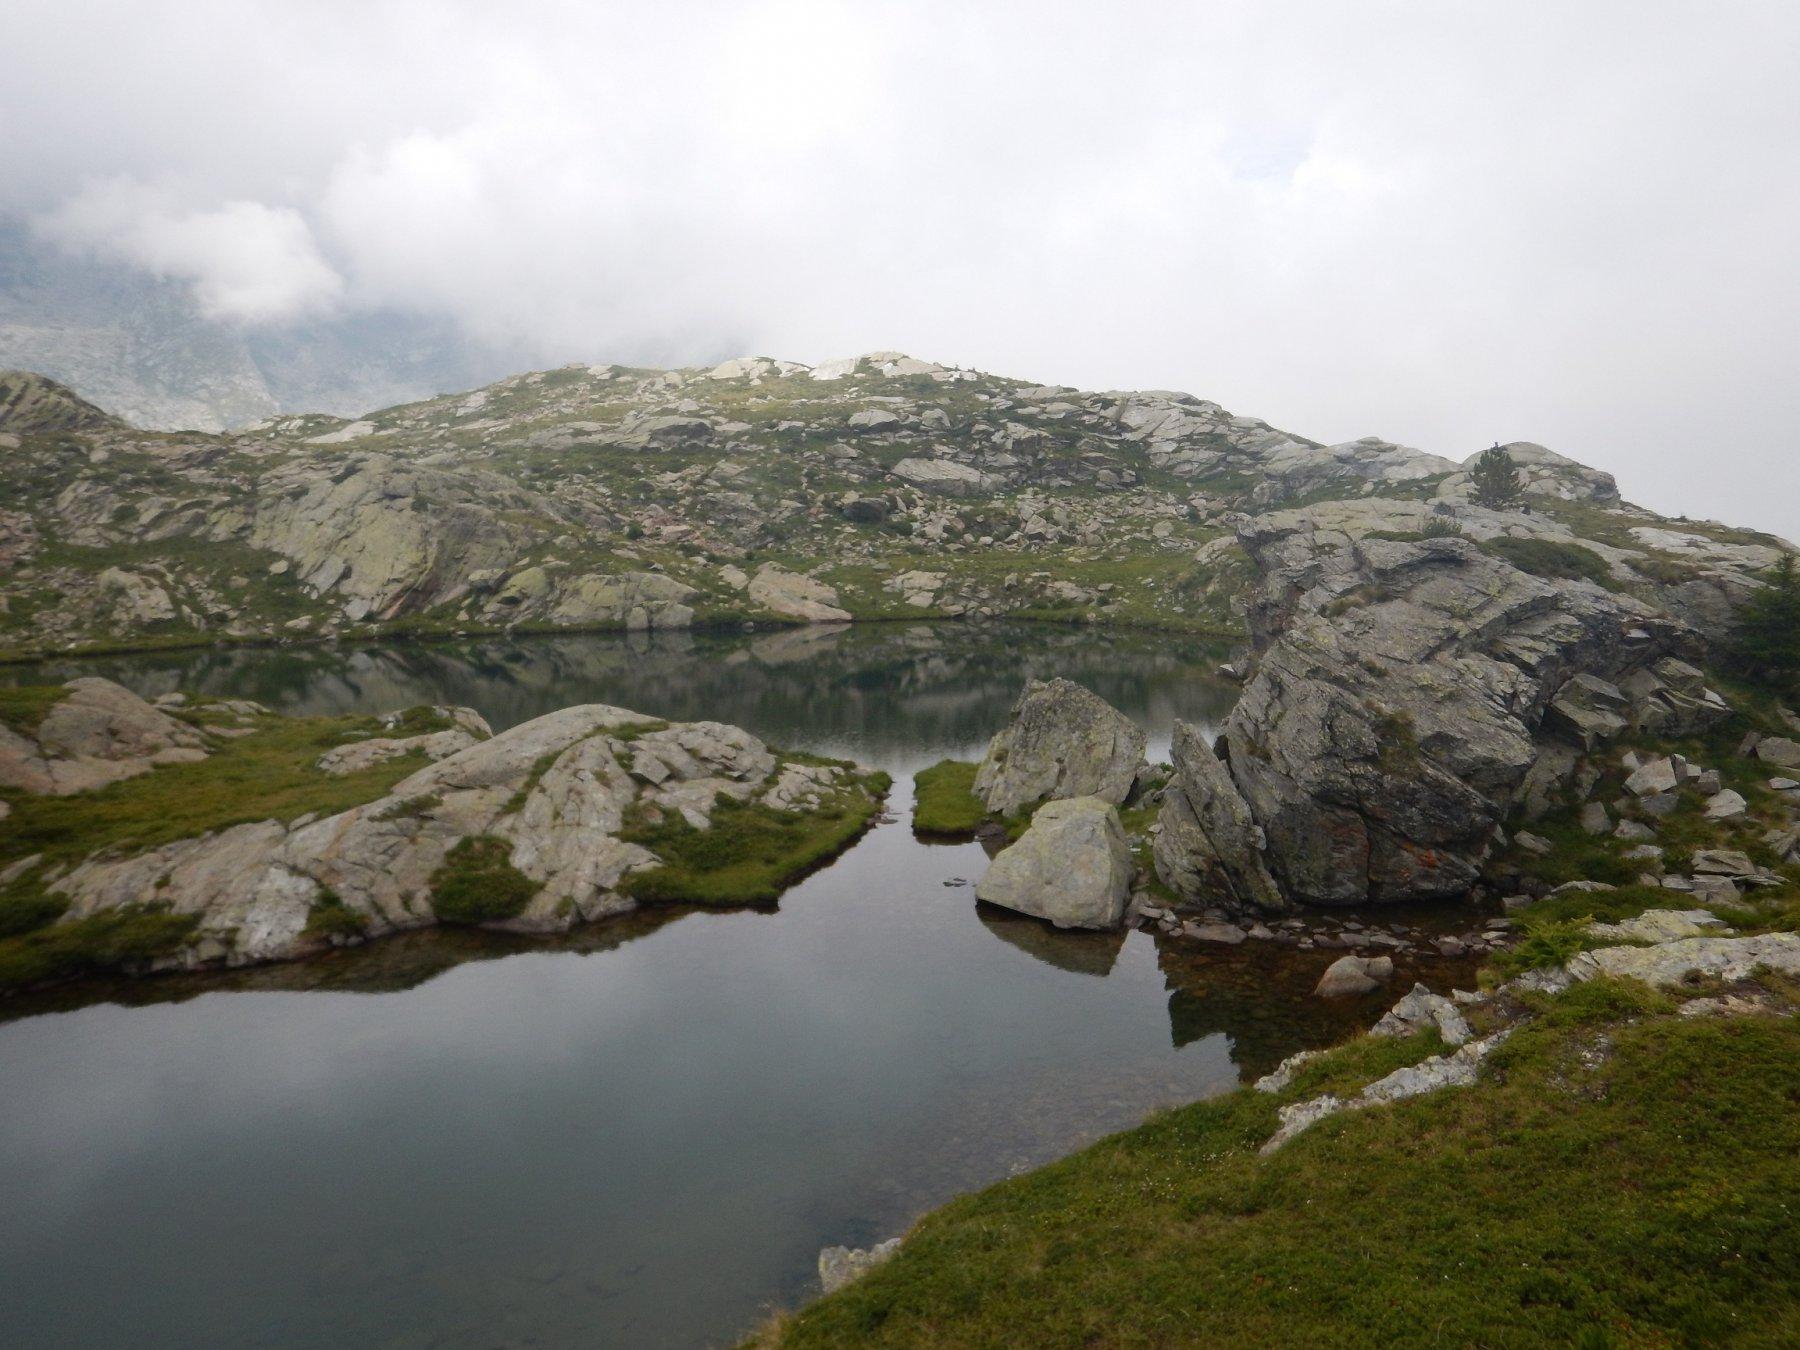 ai piccoli laghi